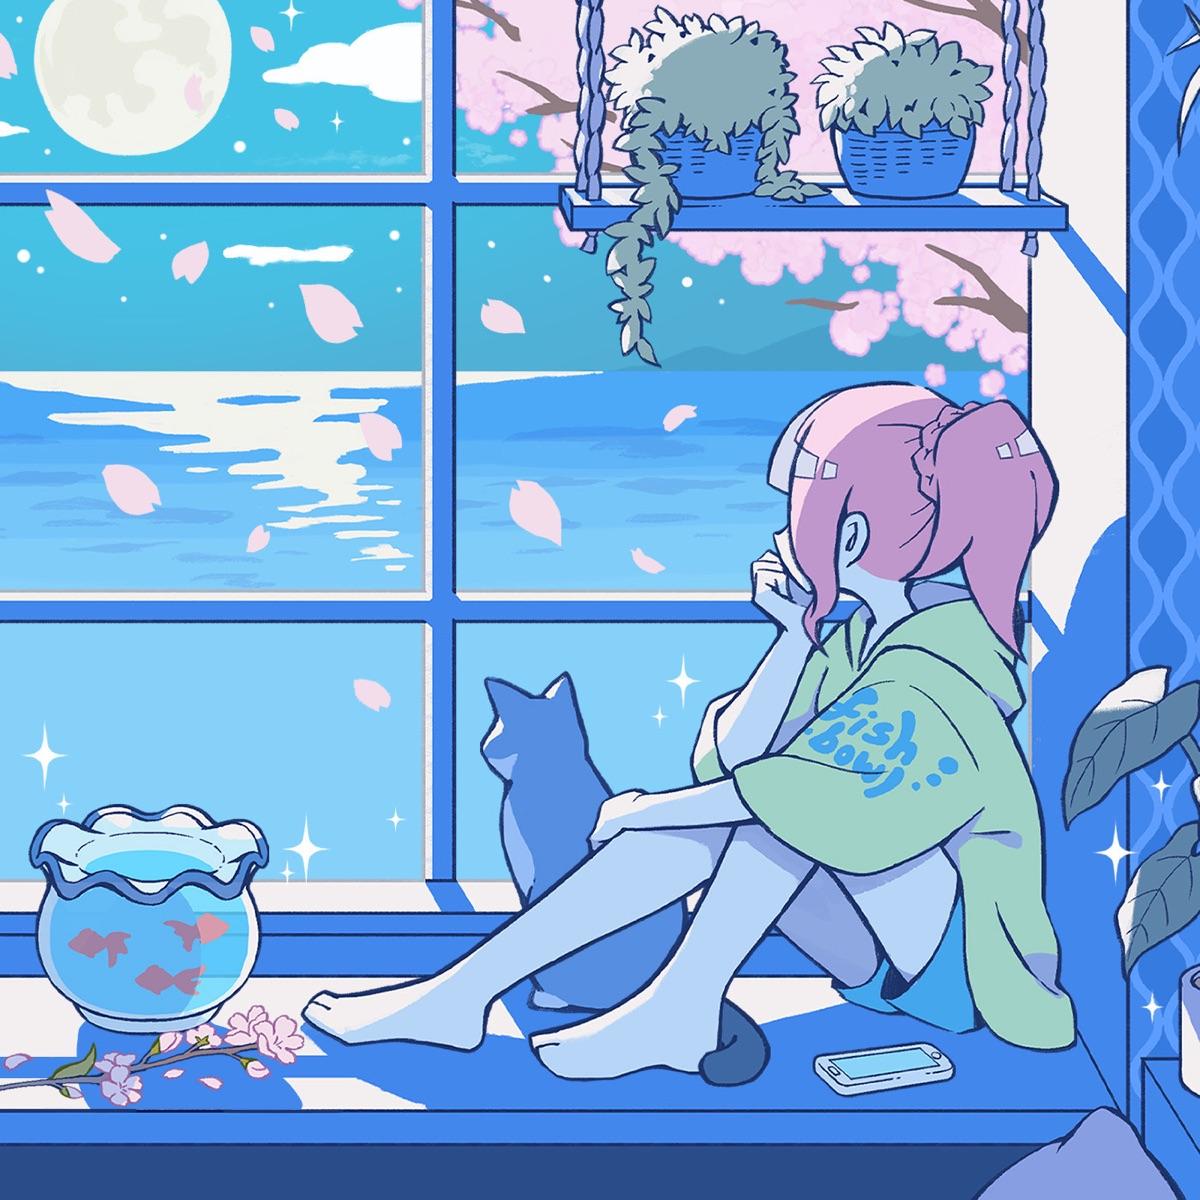 『fishbowl - 夜桜 feat.singtheseason』収録の『夜桜 feat.singtheseason』ジャケット